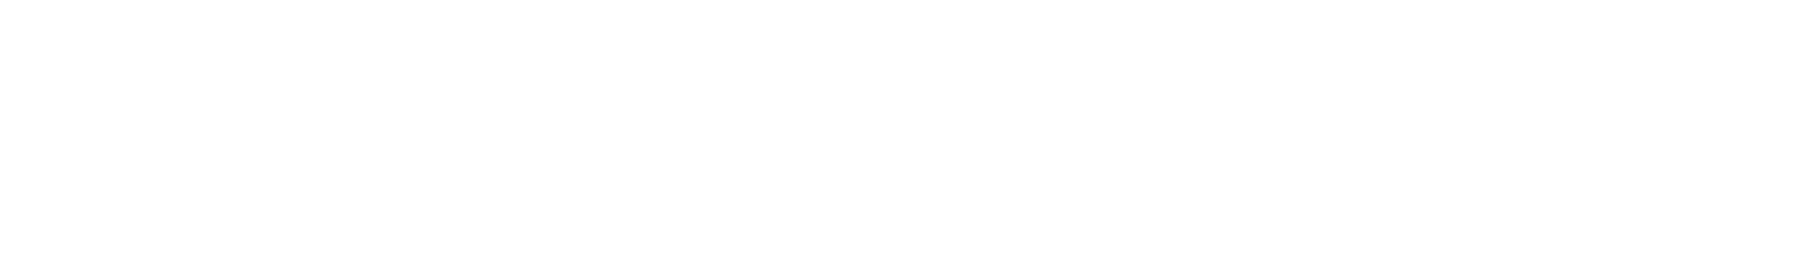 veh2 special sounds   32